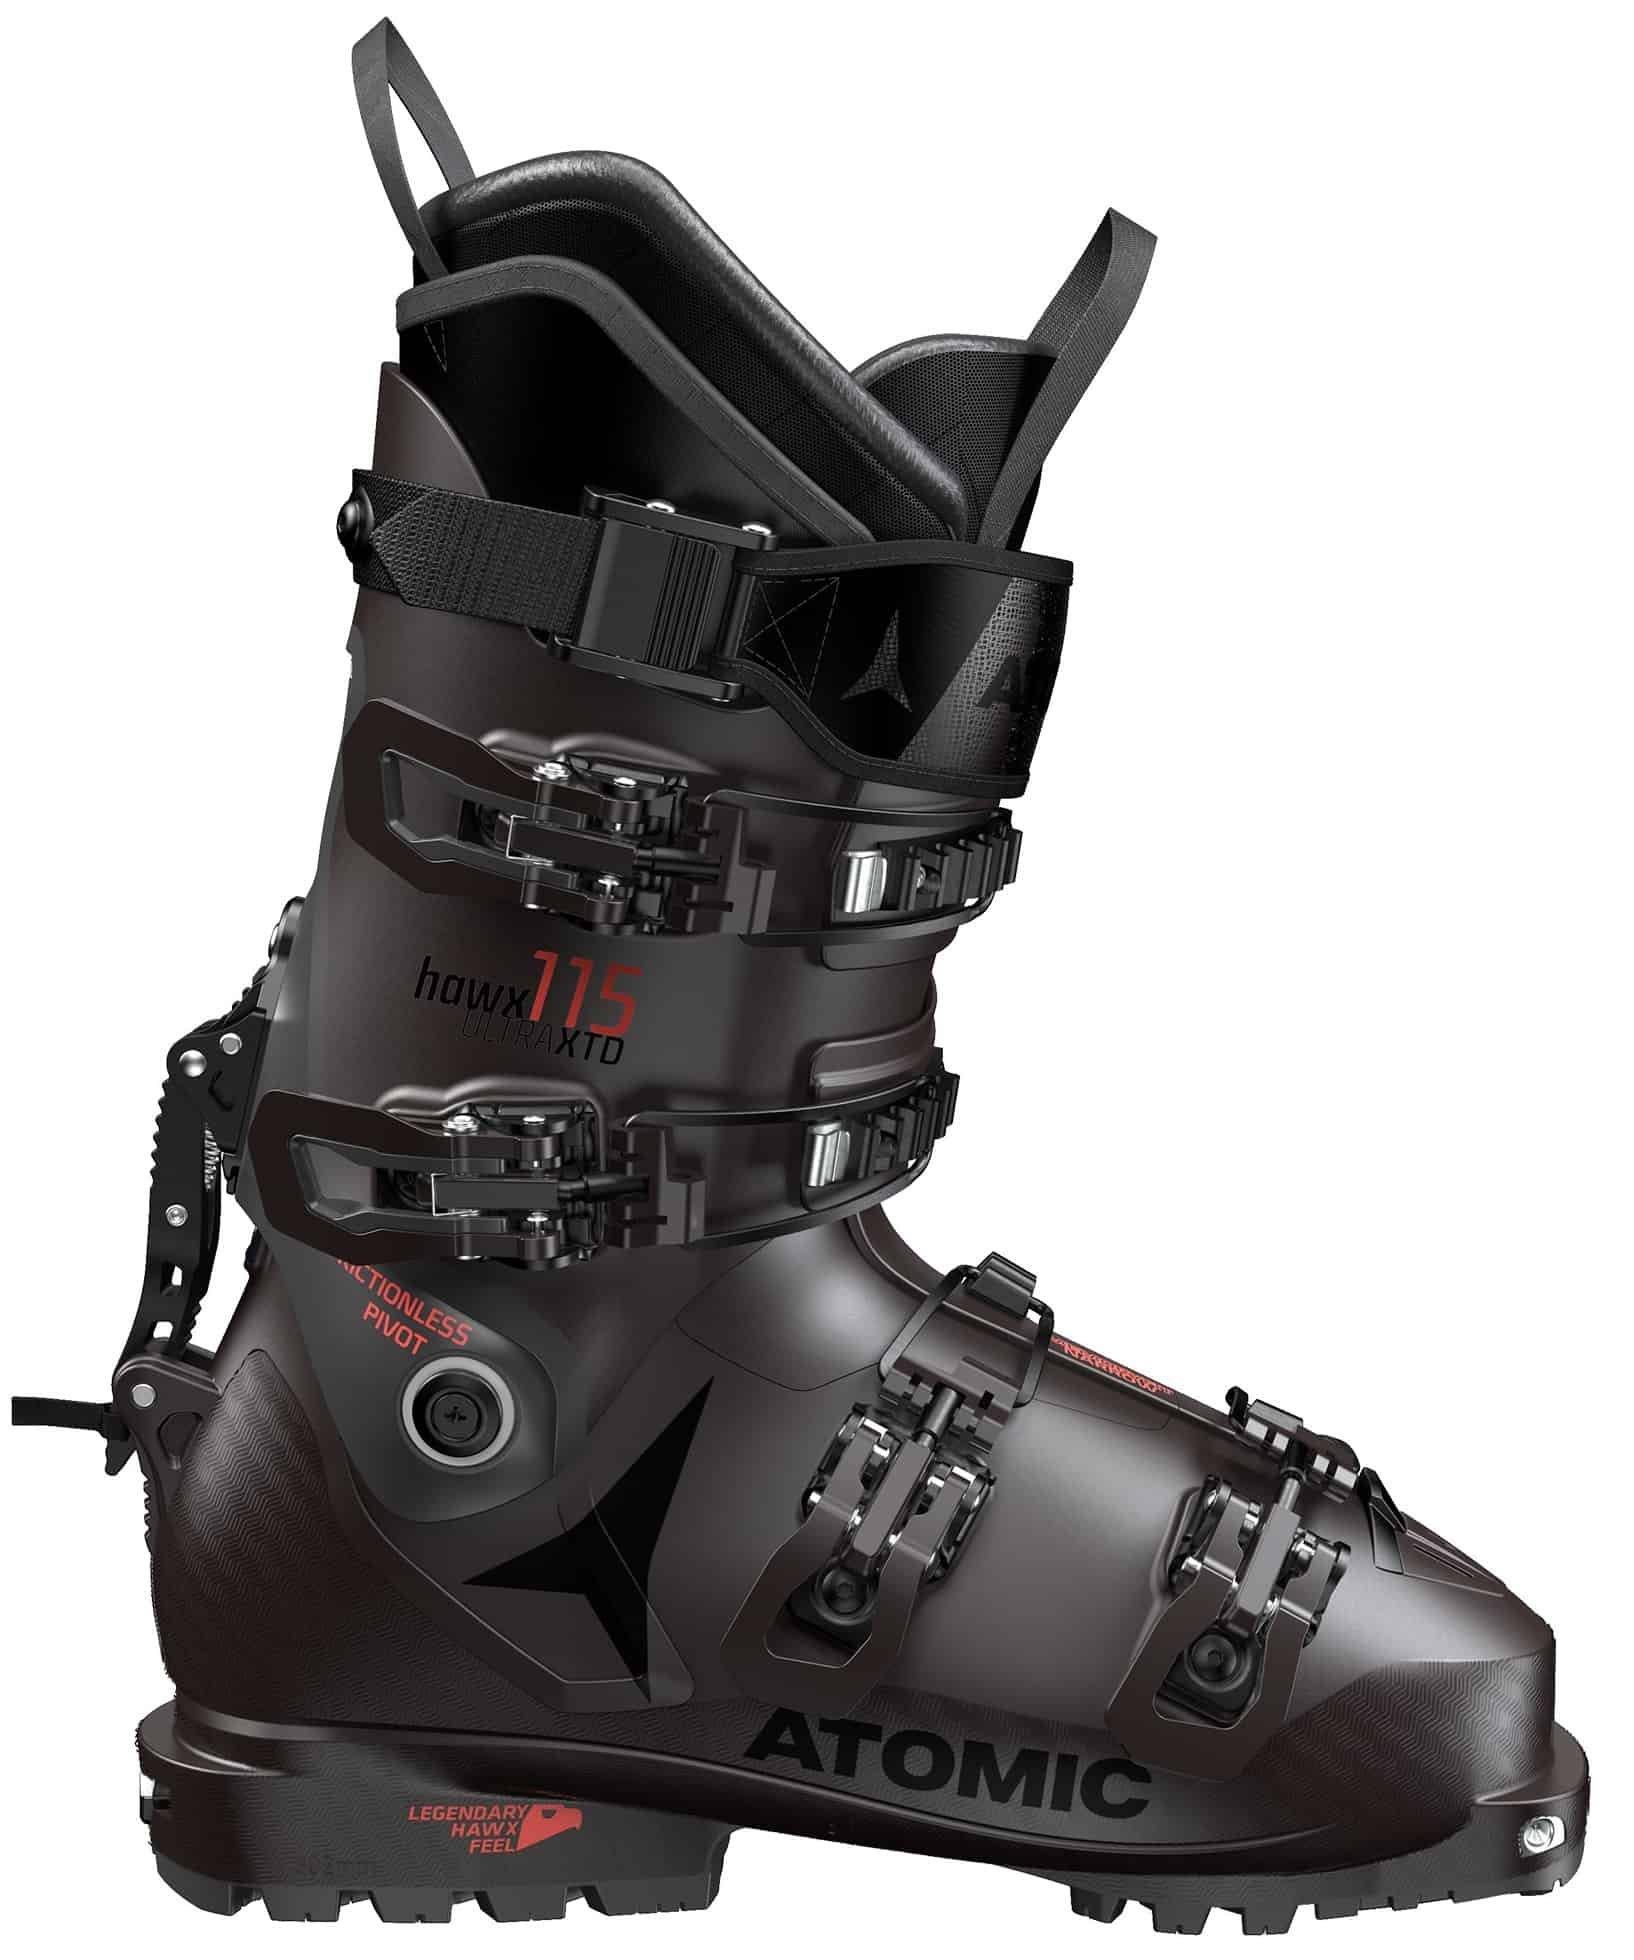 Atomic Hawx Ultra XTD 115 W 19/20